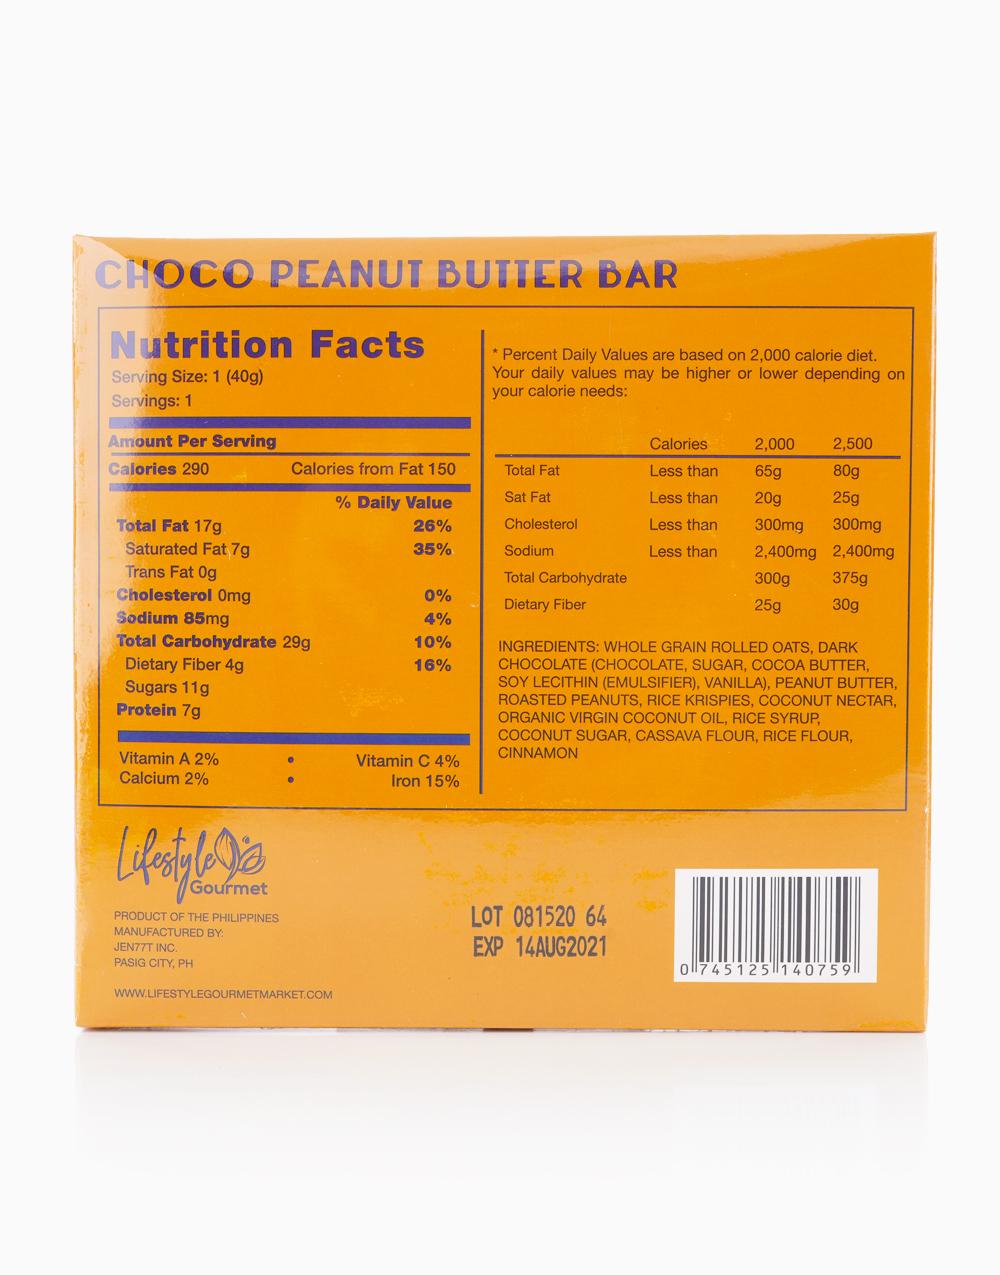 Choco Peanut Butter Bar (120g) by Lifestyle Gourmet